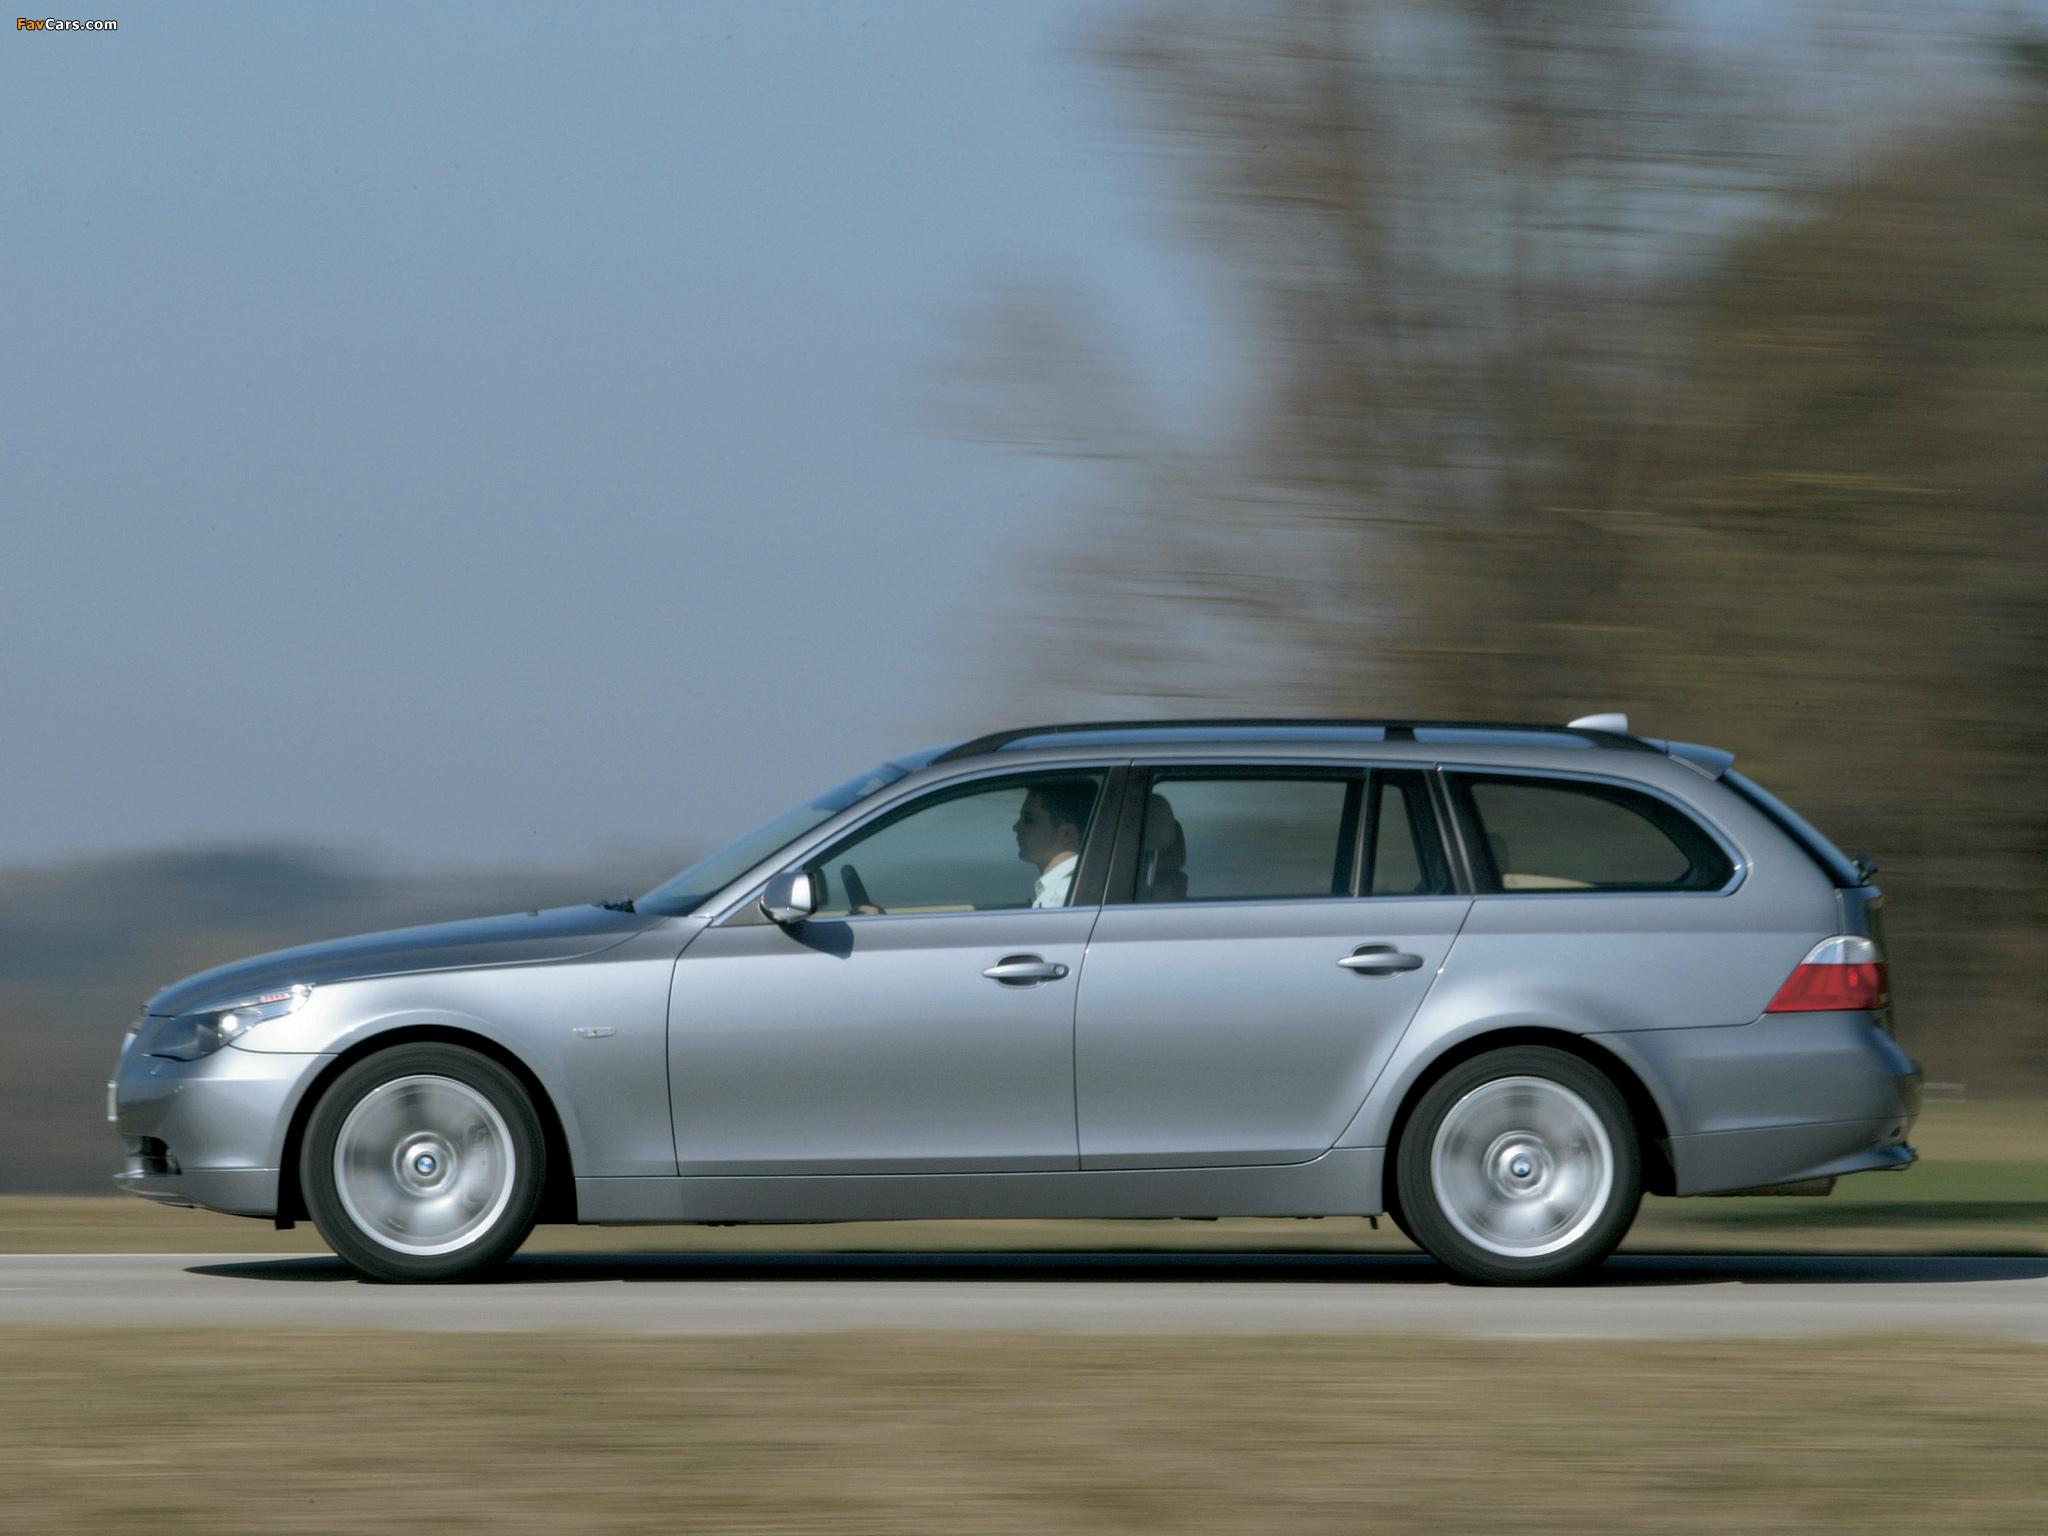 BMW 530d Touring (E61) 2004–07 images (2048x1536)